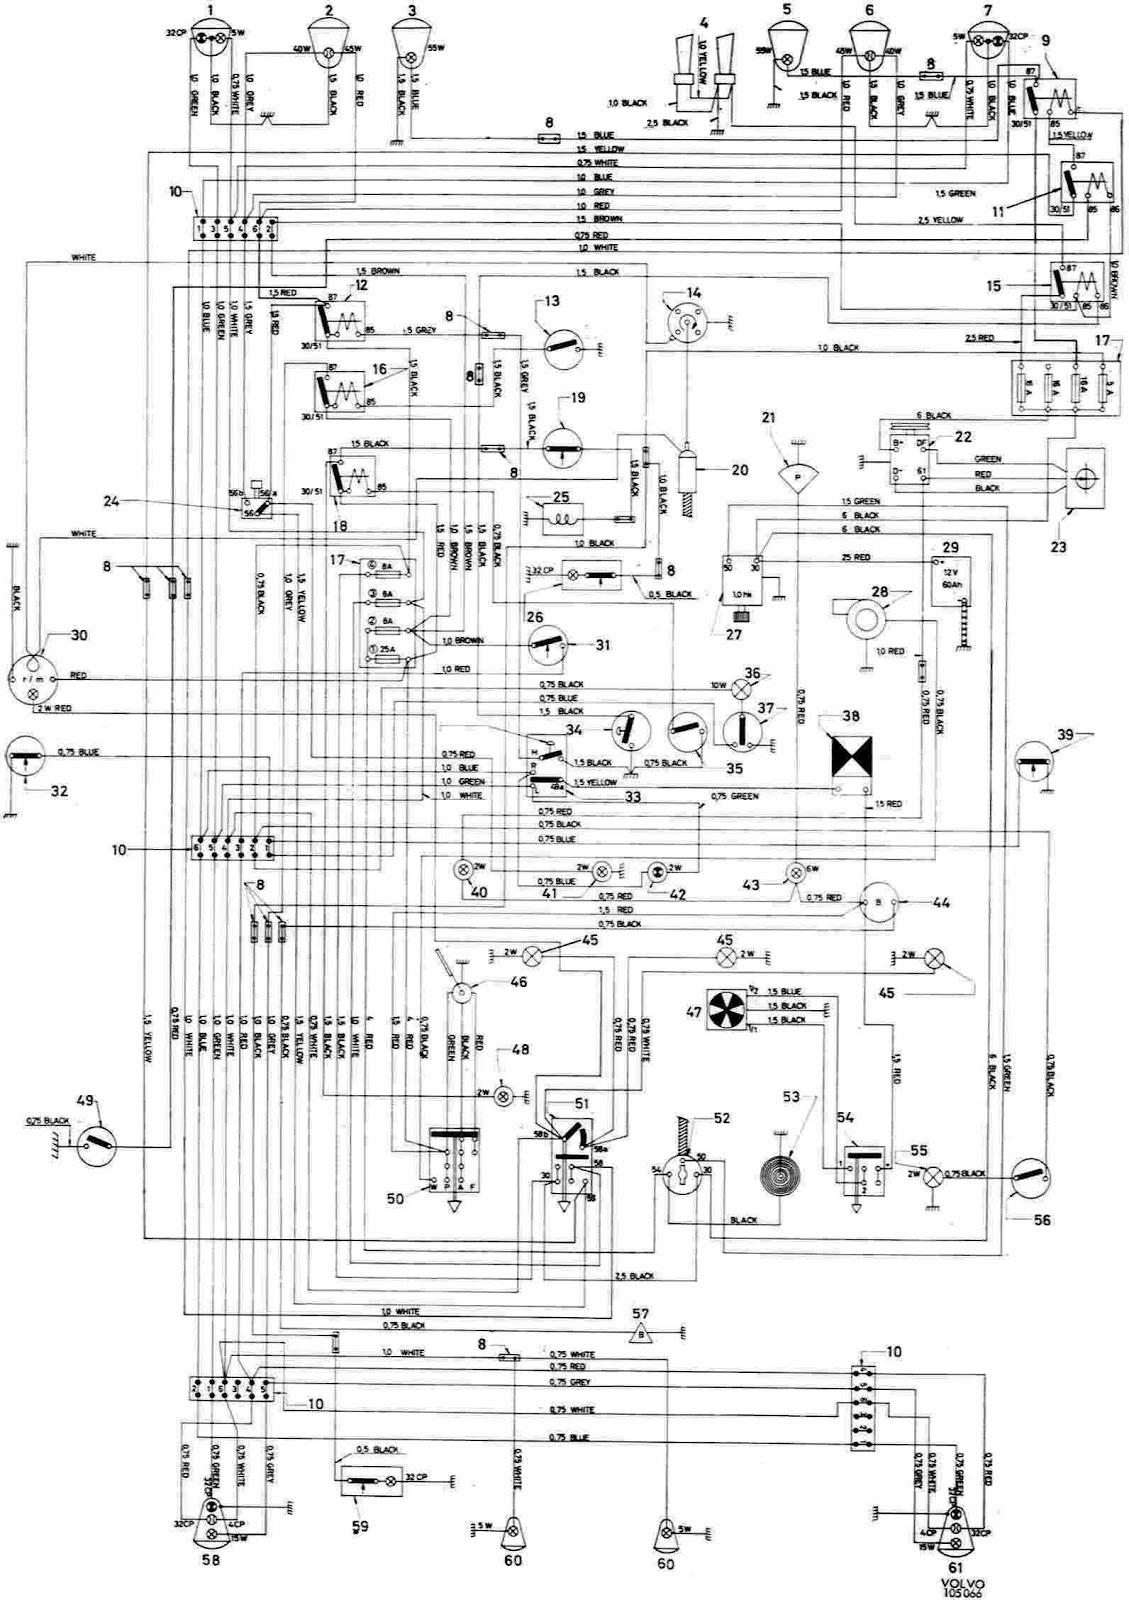 06 Volvo S40 Radio Wiring Diagram